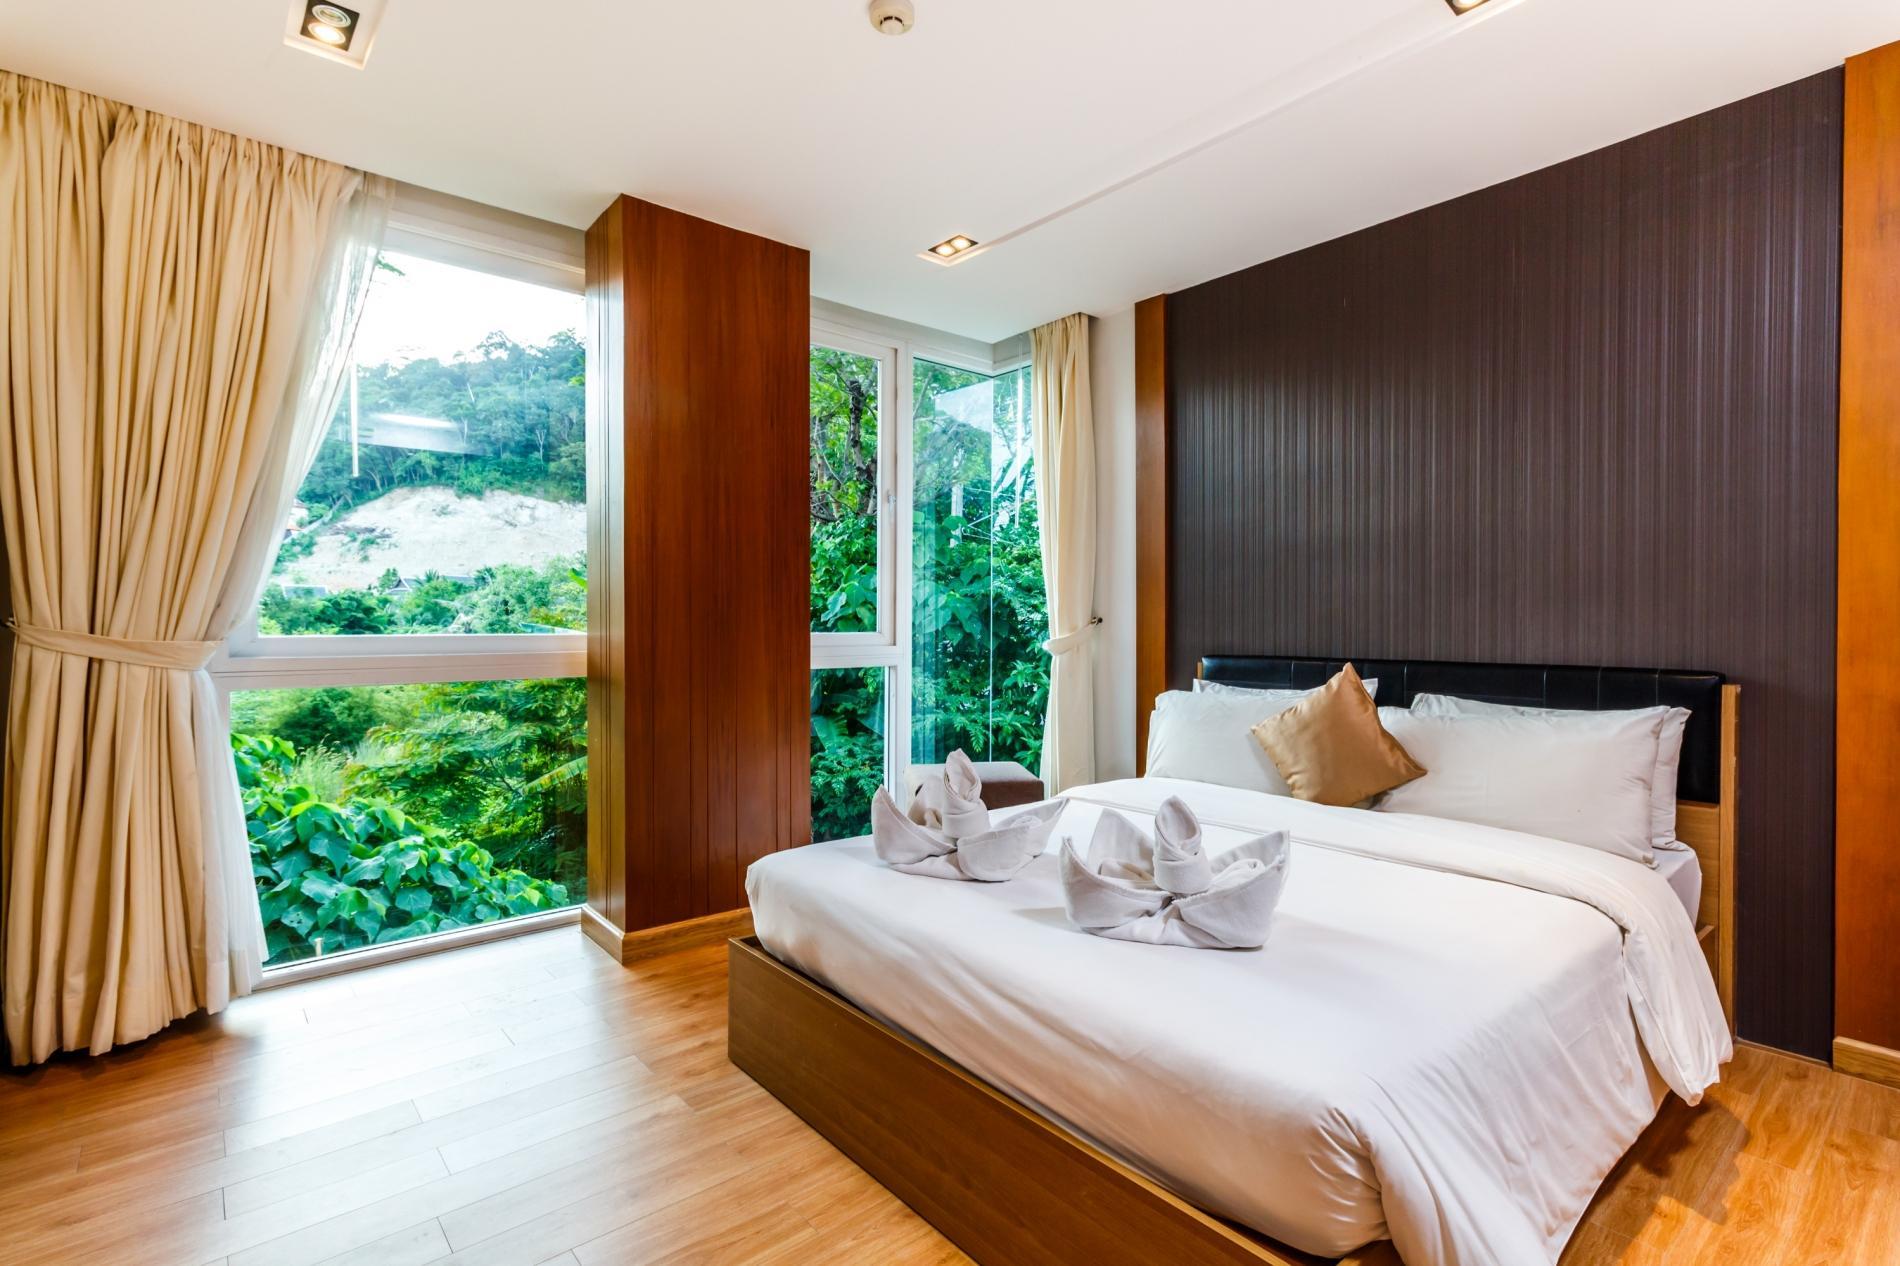 Apartment Privilege12 - Seaview 3 bedroom luxury apartment on Kalim bay photo 20257828